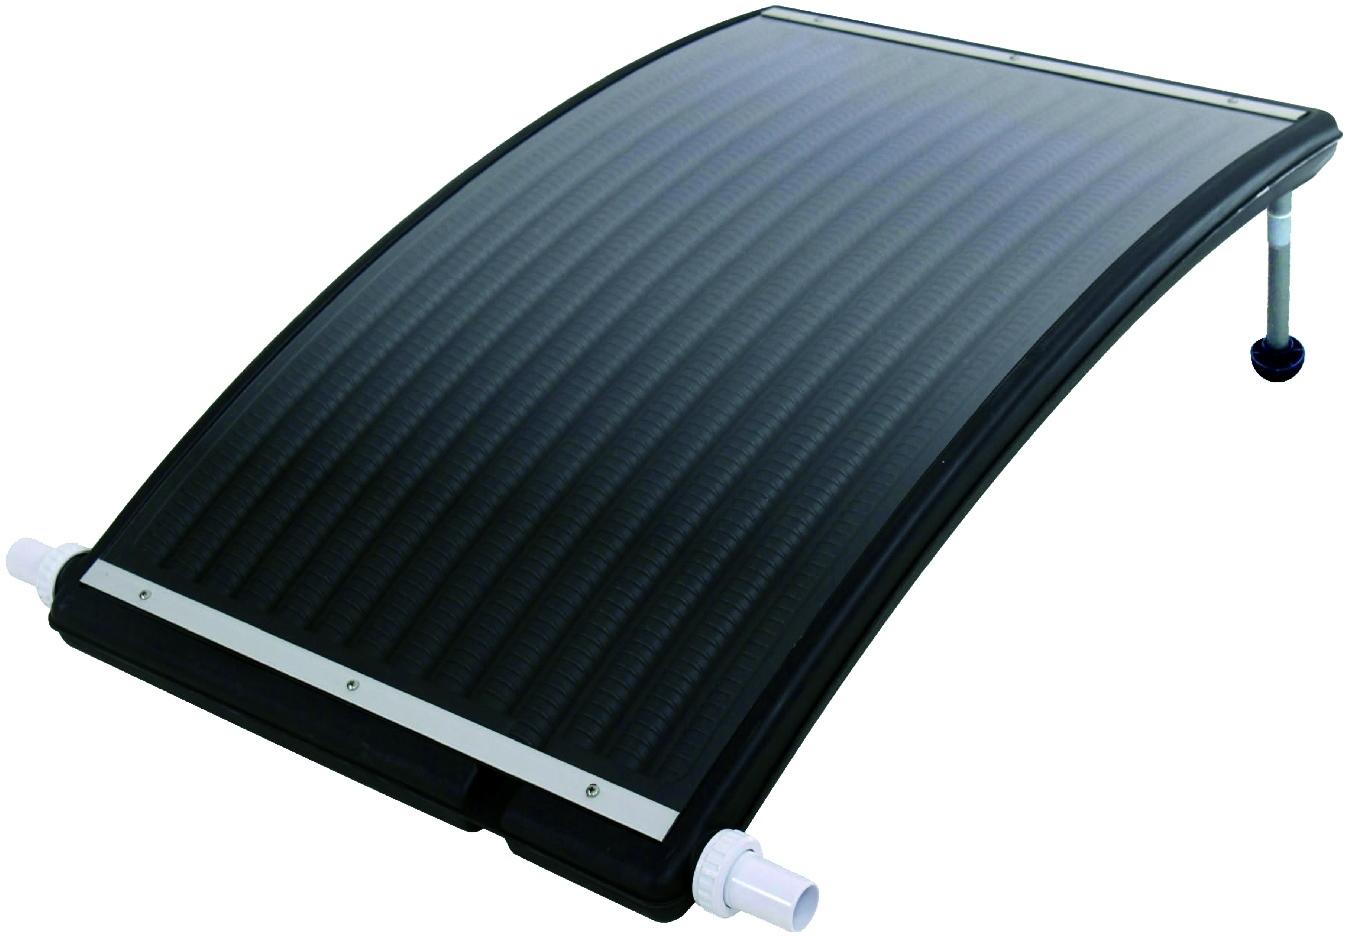 MARIMEX Ohřev solární Slim 3000